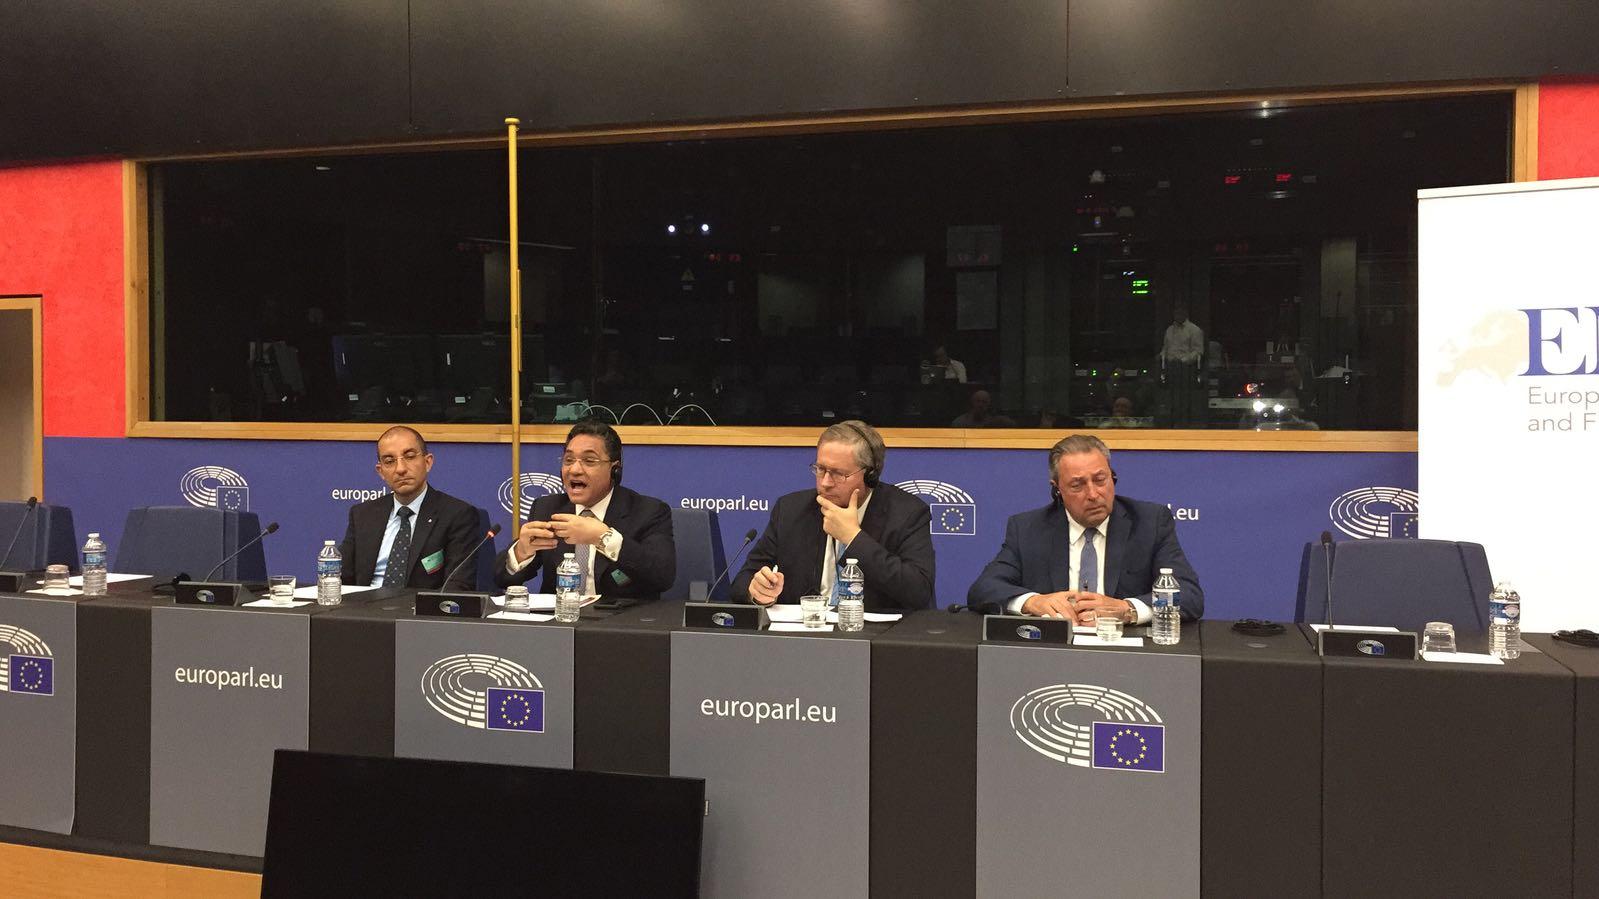 Ali warns against prevalence of Brotherhood ideology in Europe